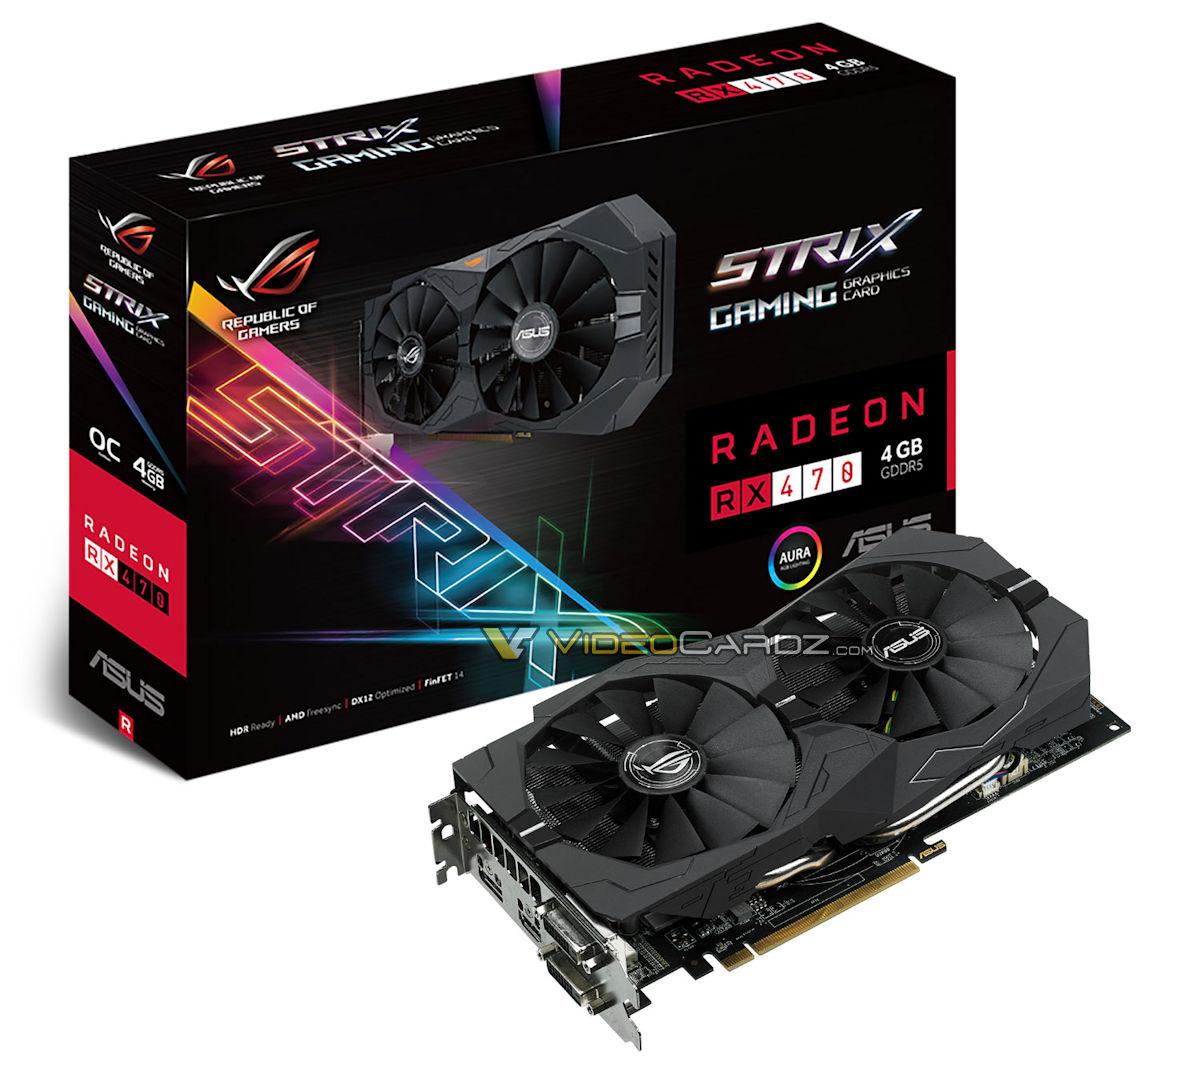 Radeon RX 470 ASUS RX 470 STRIX 4GB